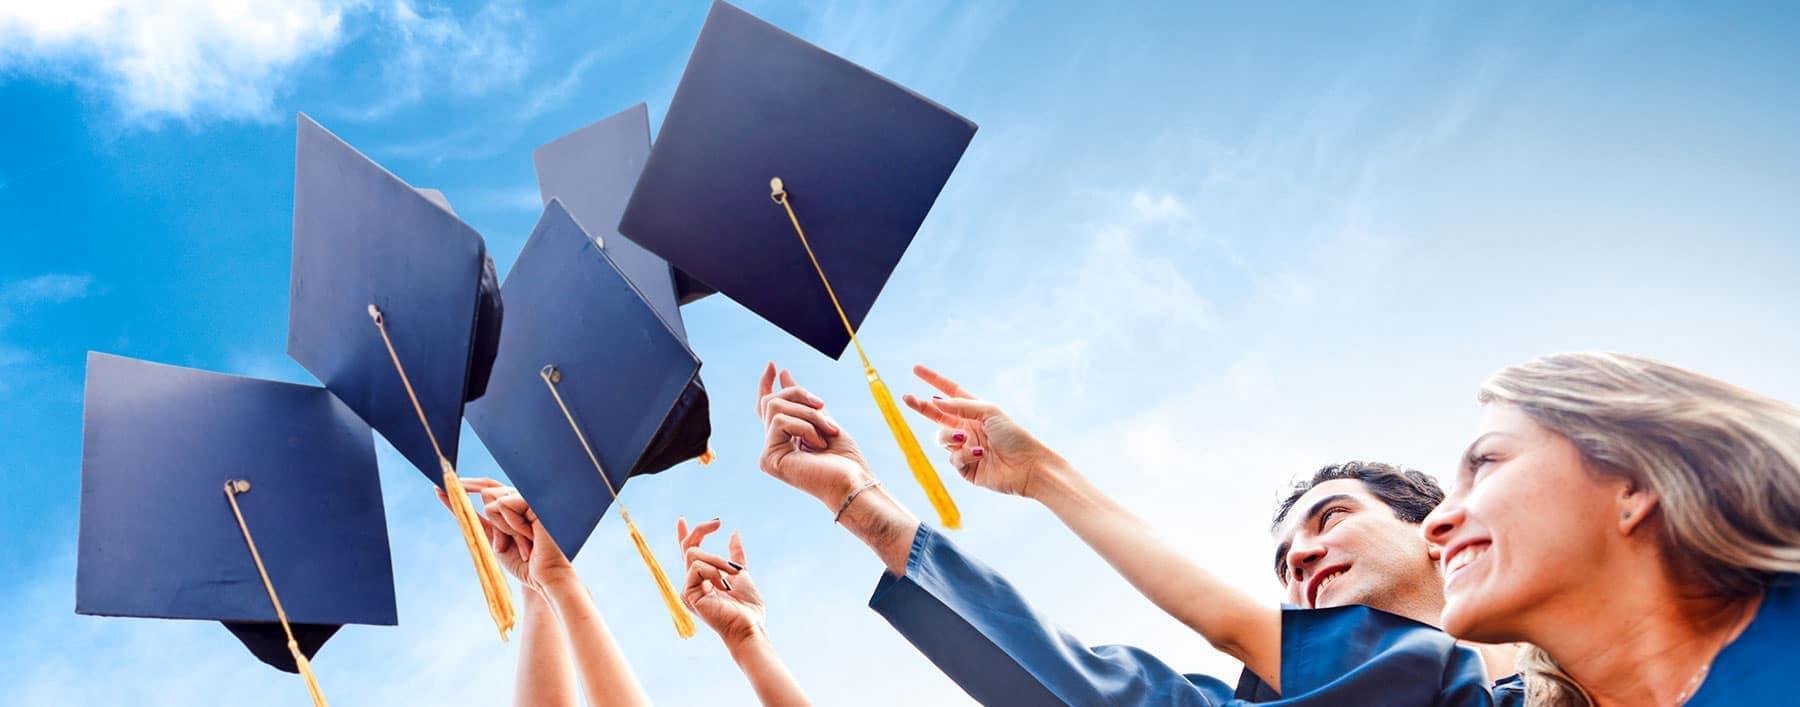 students throwing grad caps